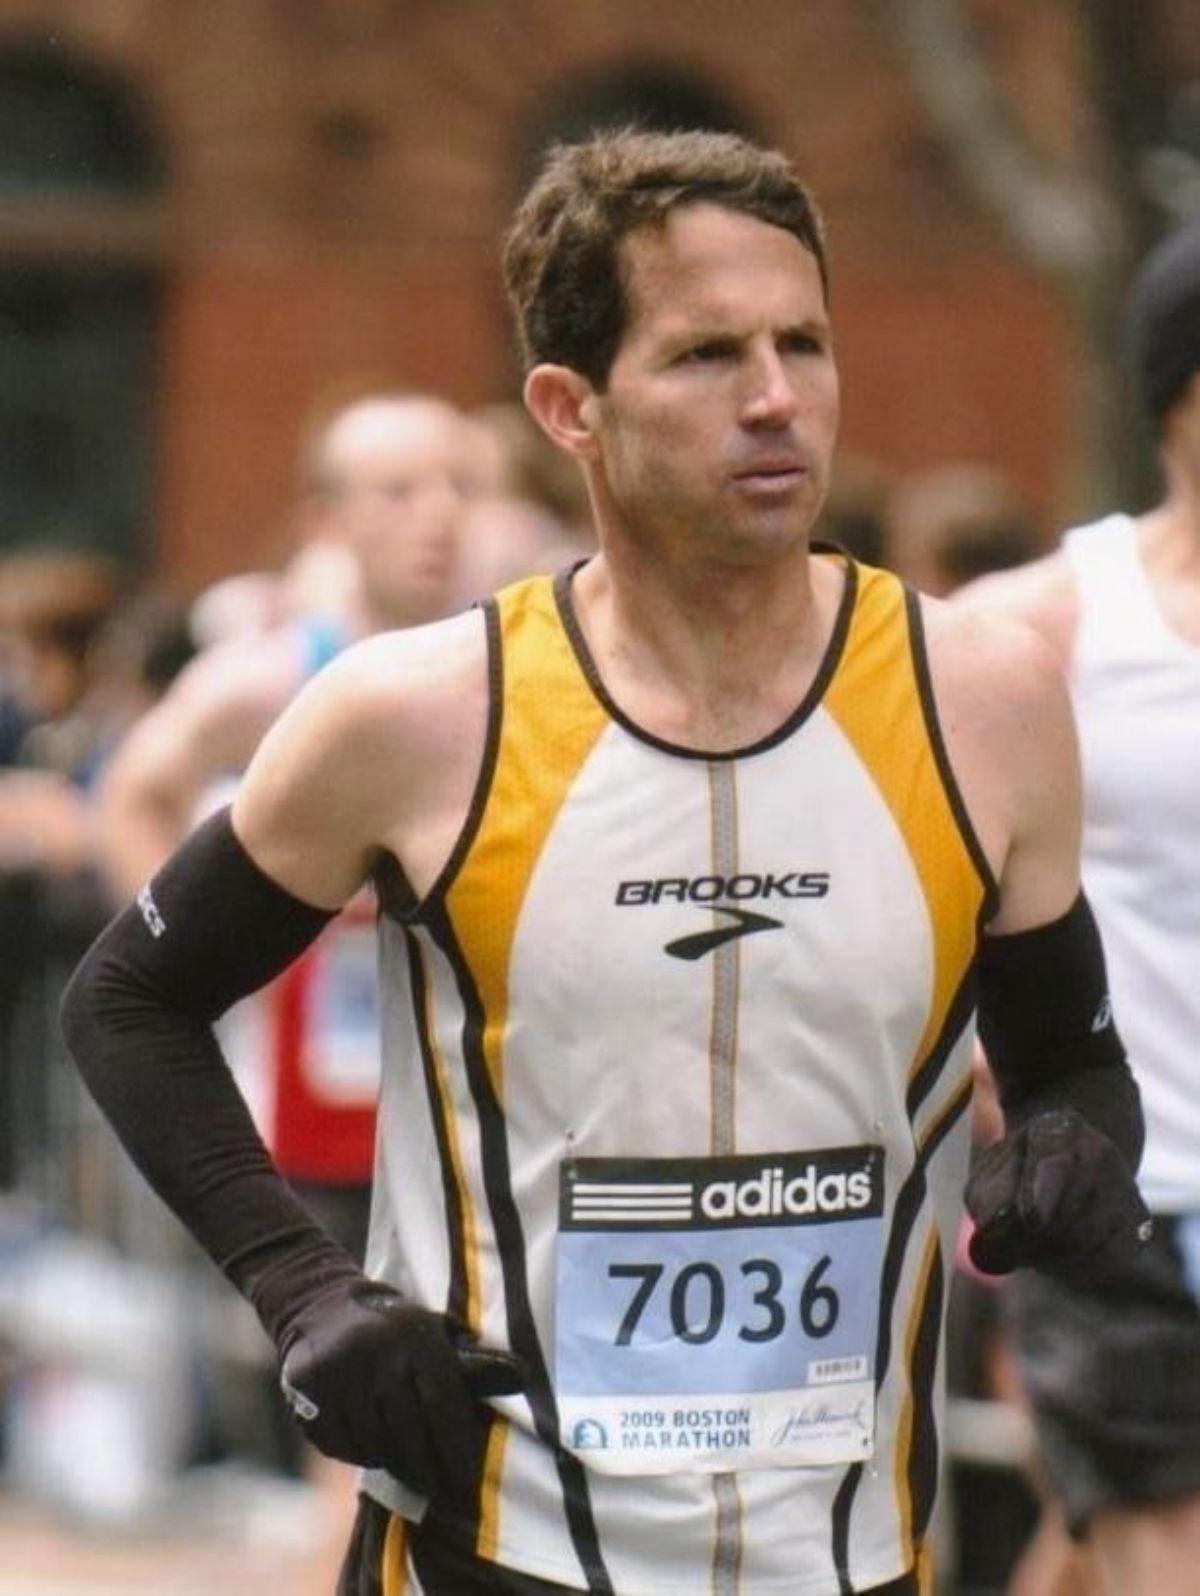 Coach Seckel Qualifies for his 13th consecutive Boston Marathon